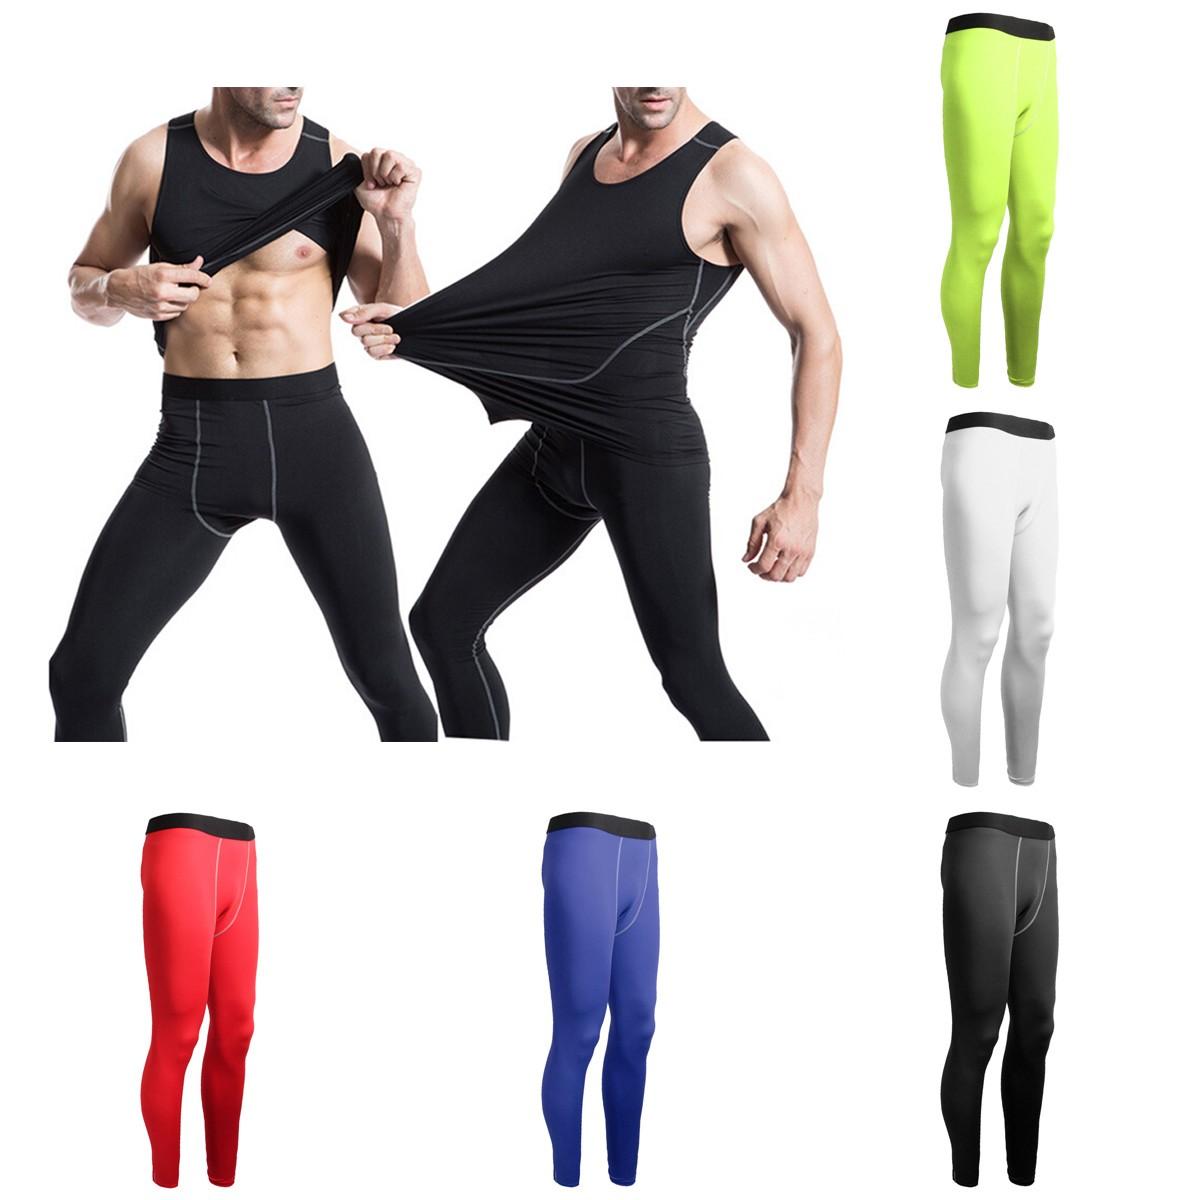 d2135b4ebd8e2 Men Sports Pants Base Layers Tights Compression Long Pants For Training  Fitness · eddafee0-9e40-4583-b478-6107d624da21.jpg ...